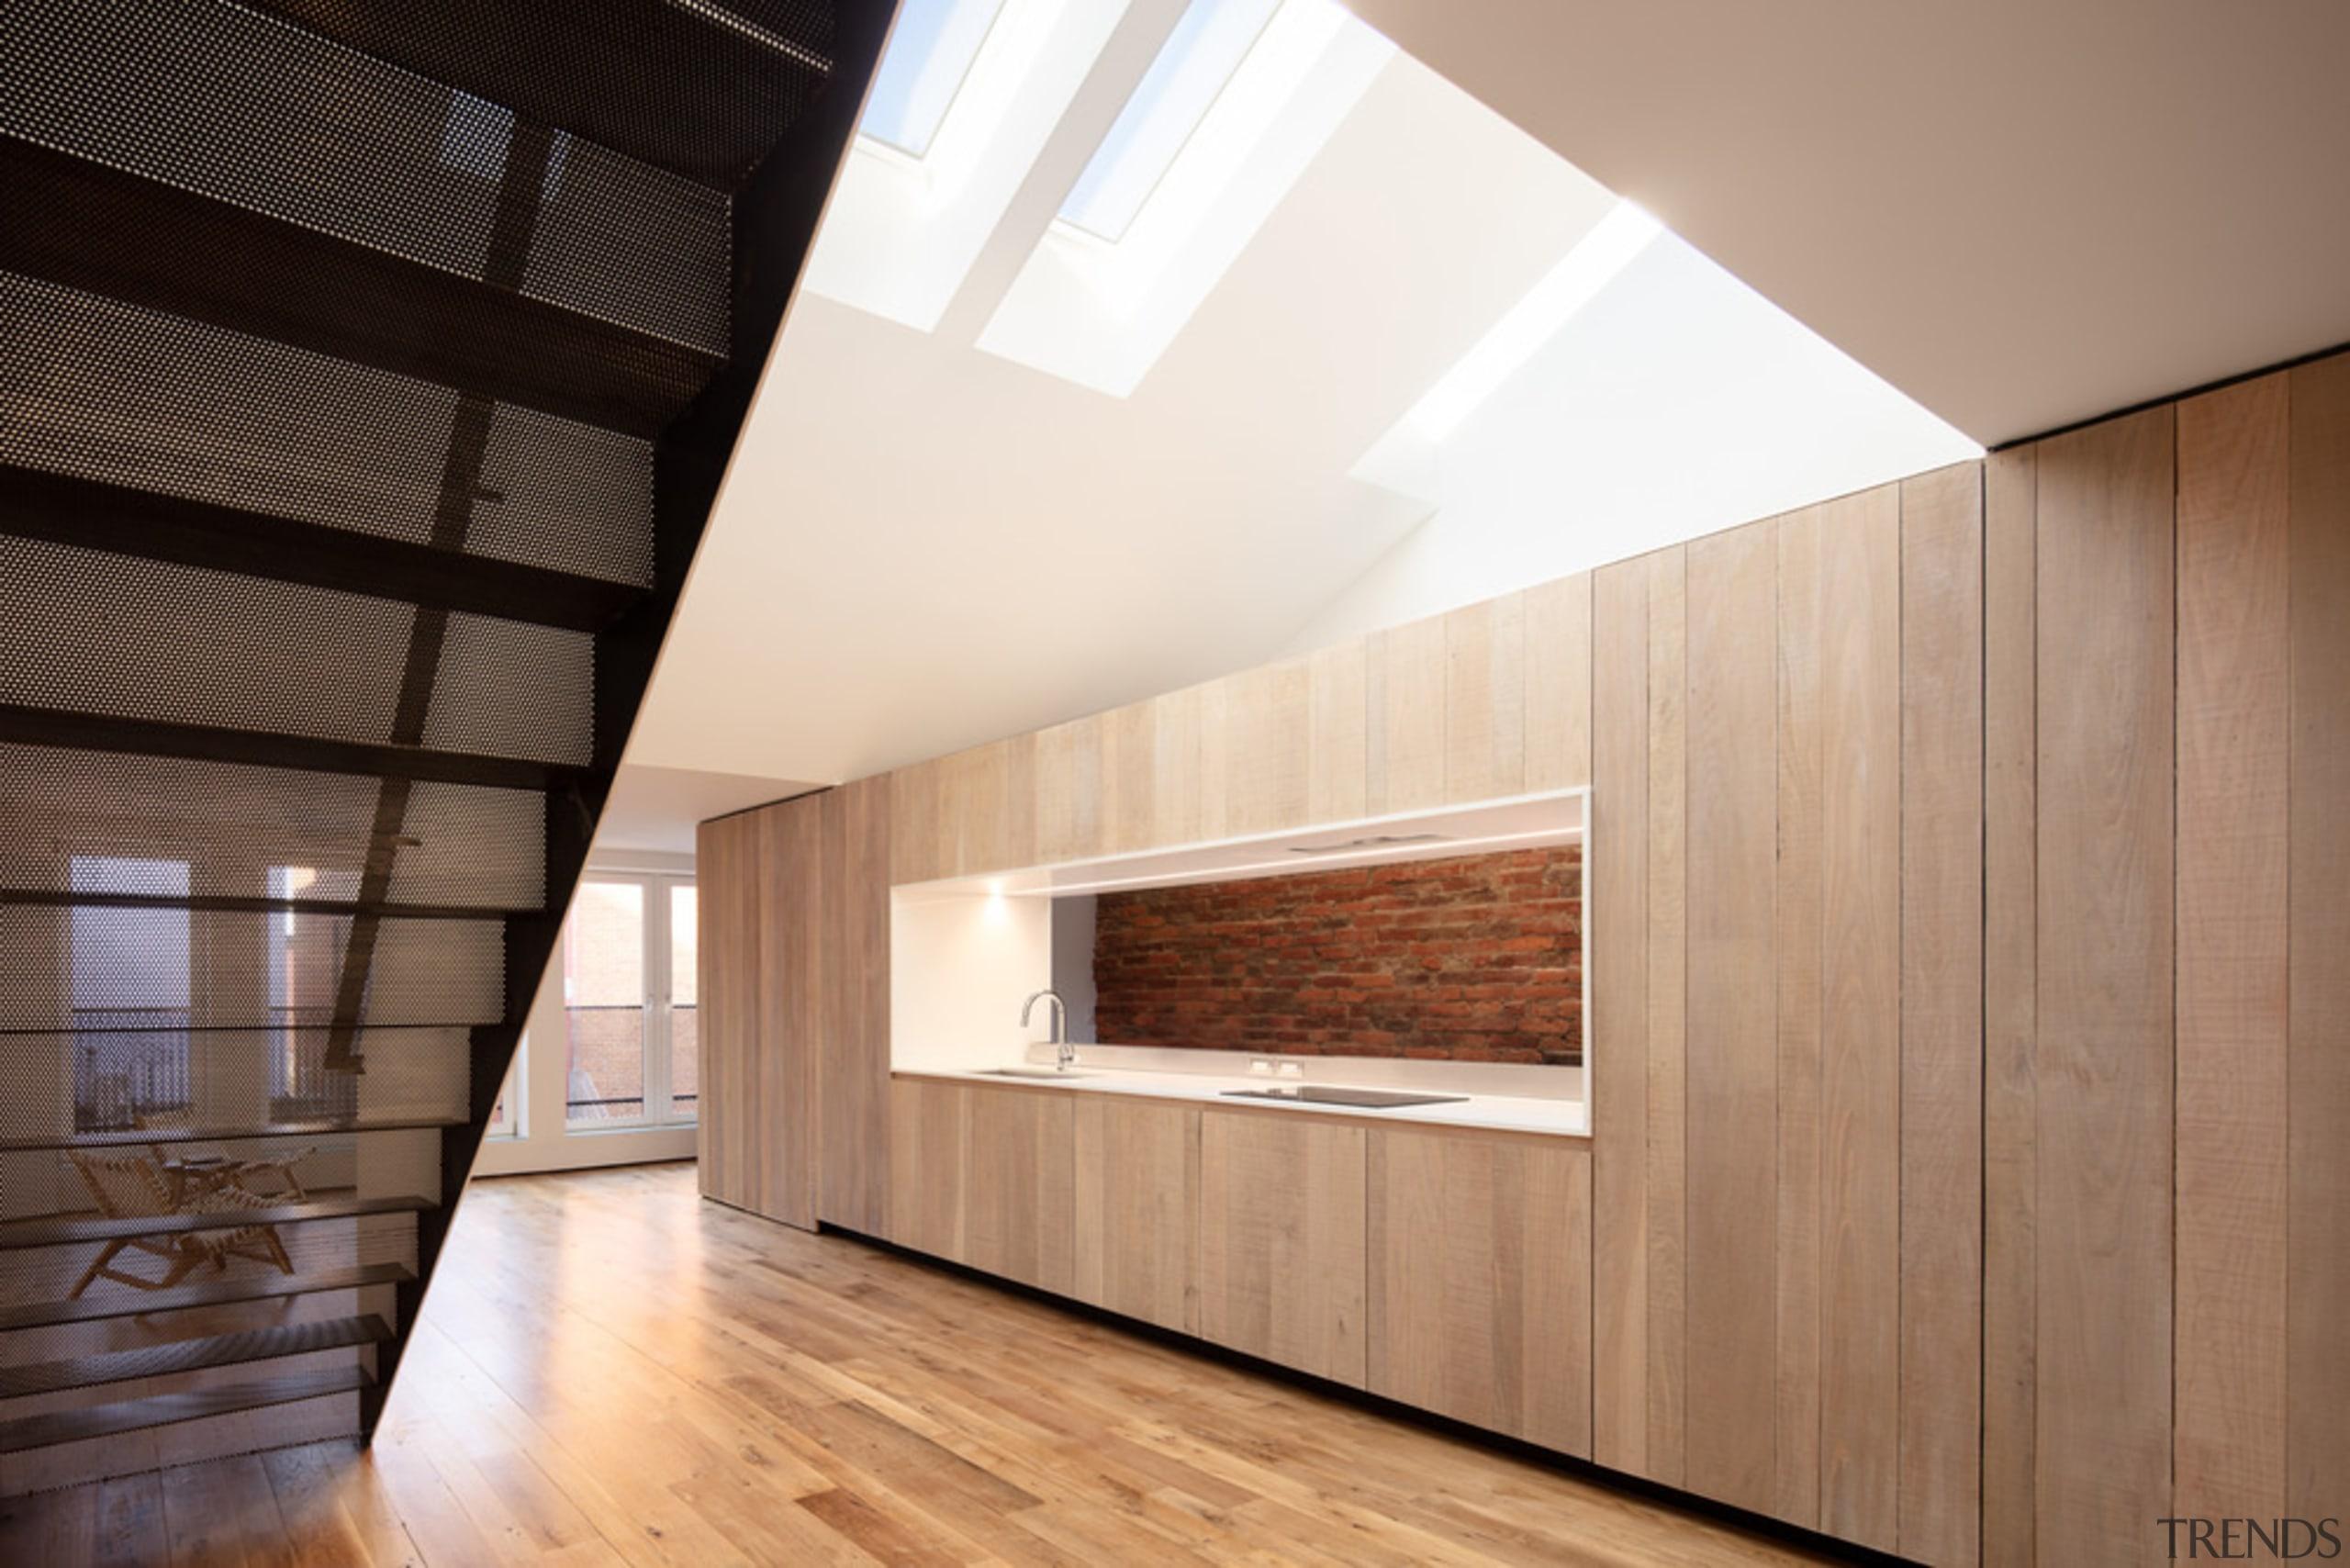 A window-like opening through the oak cabinet volume